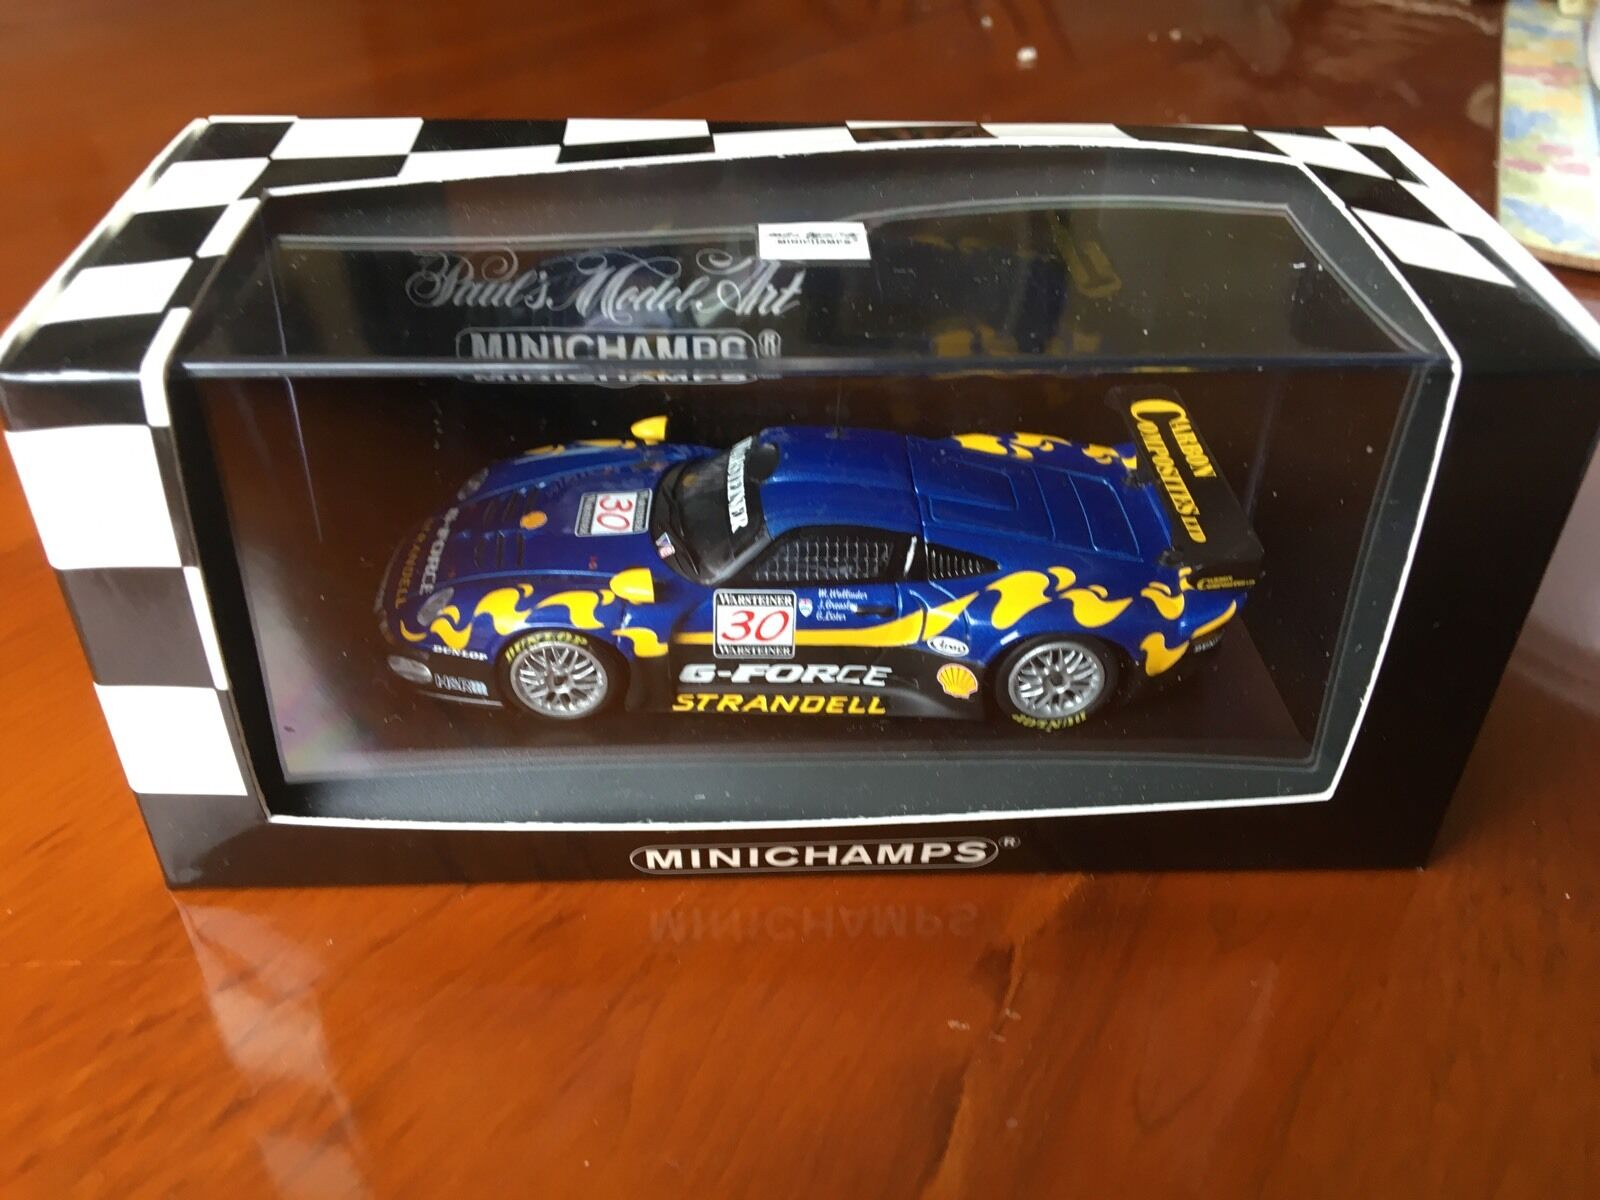 Minichamps Porsche 911 GT 1, FIA GT Series 1997. Team bluee Coral.